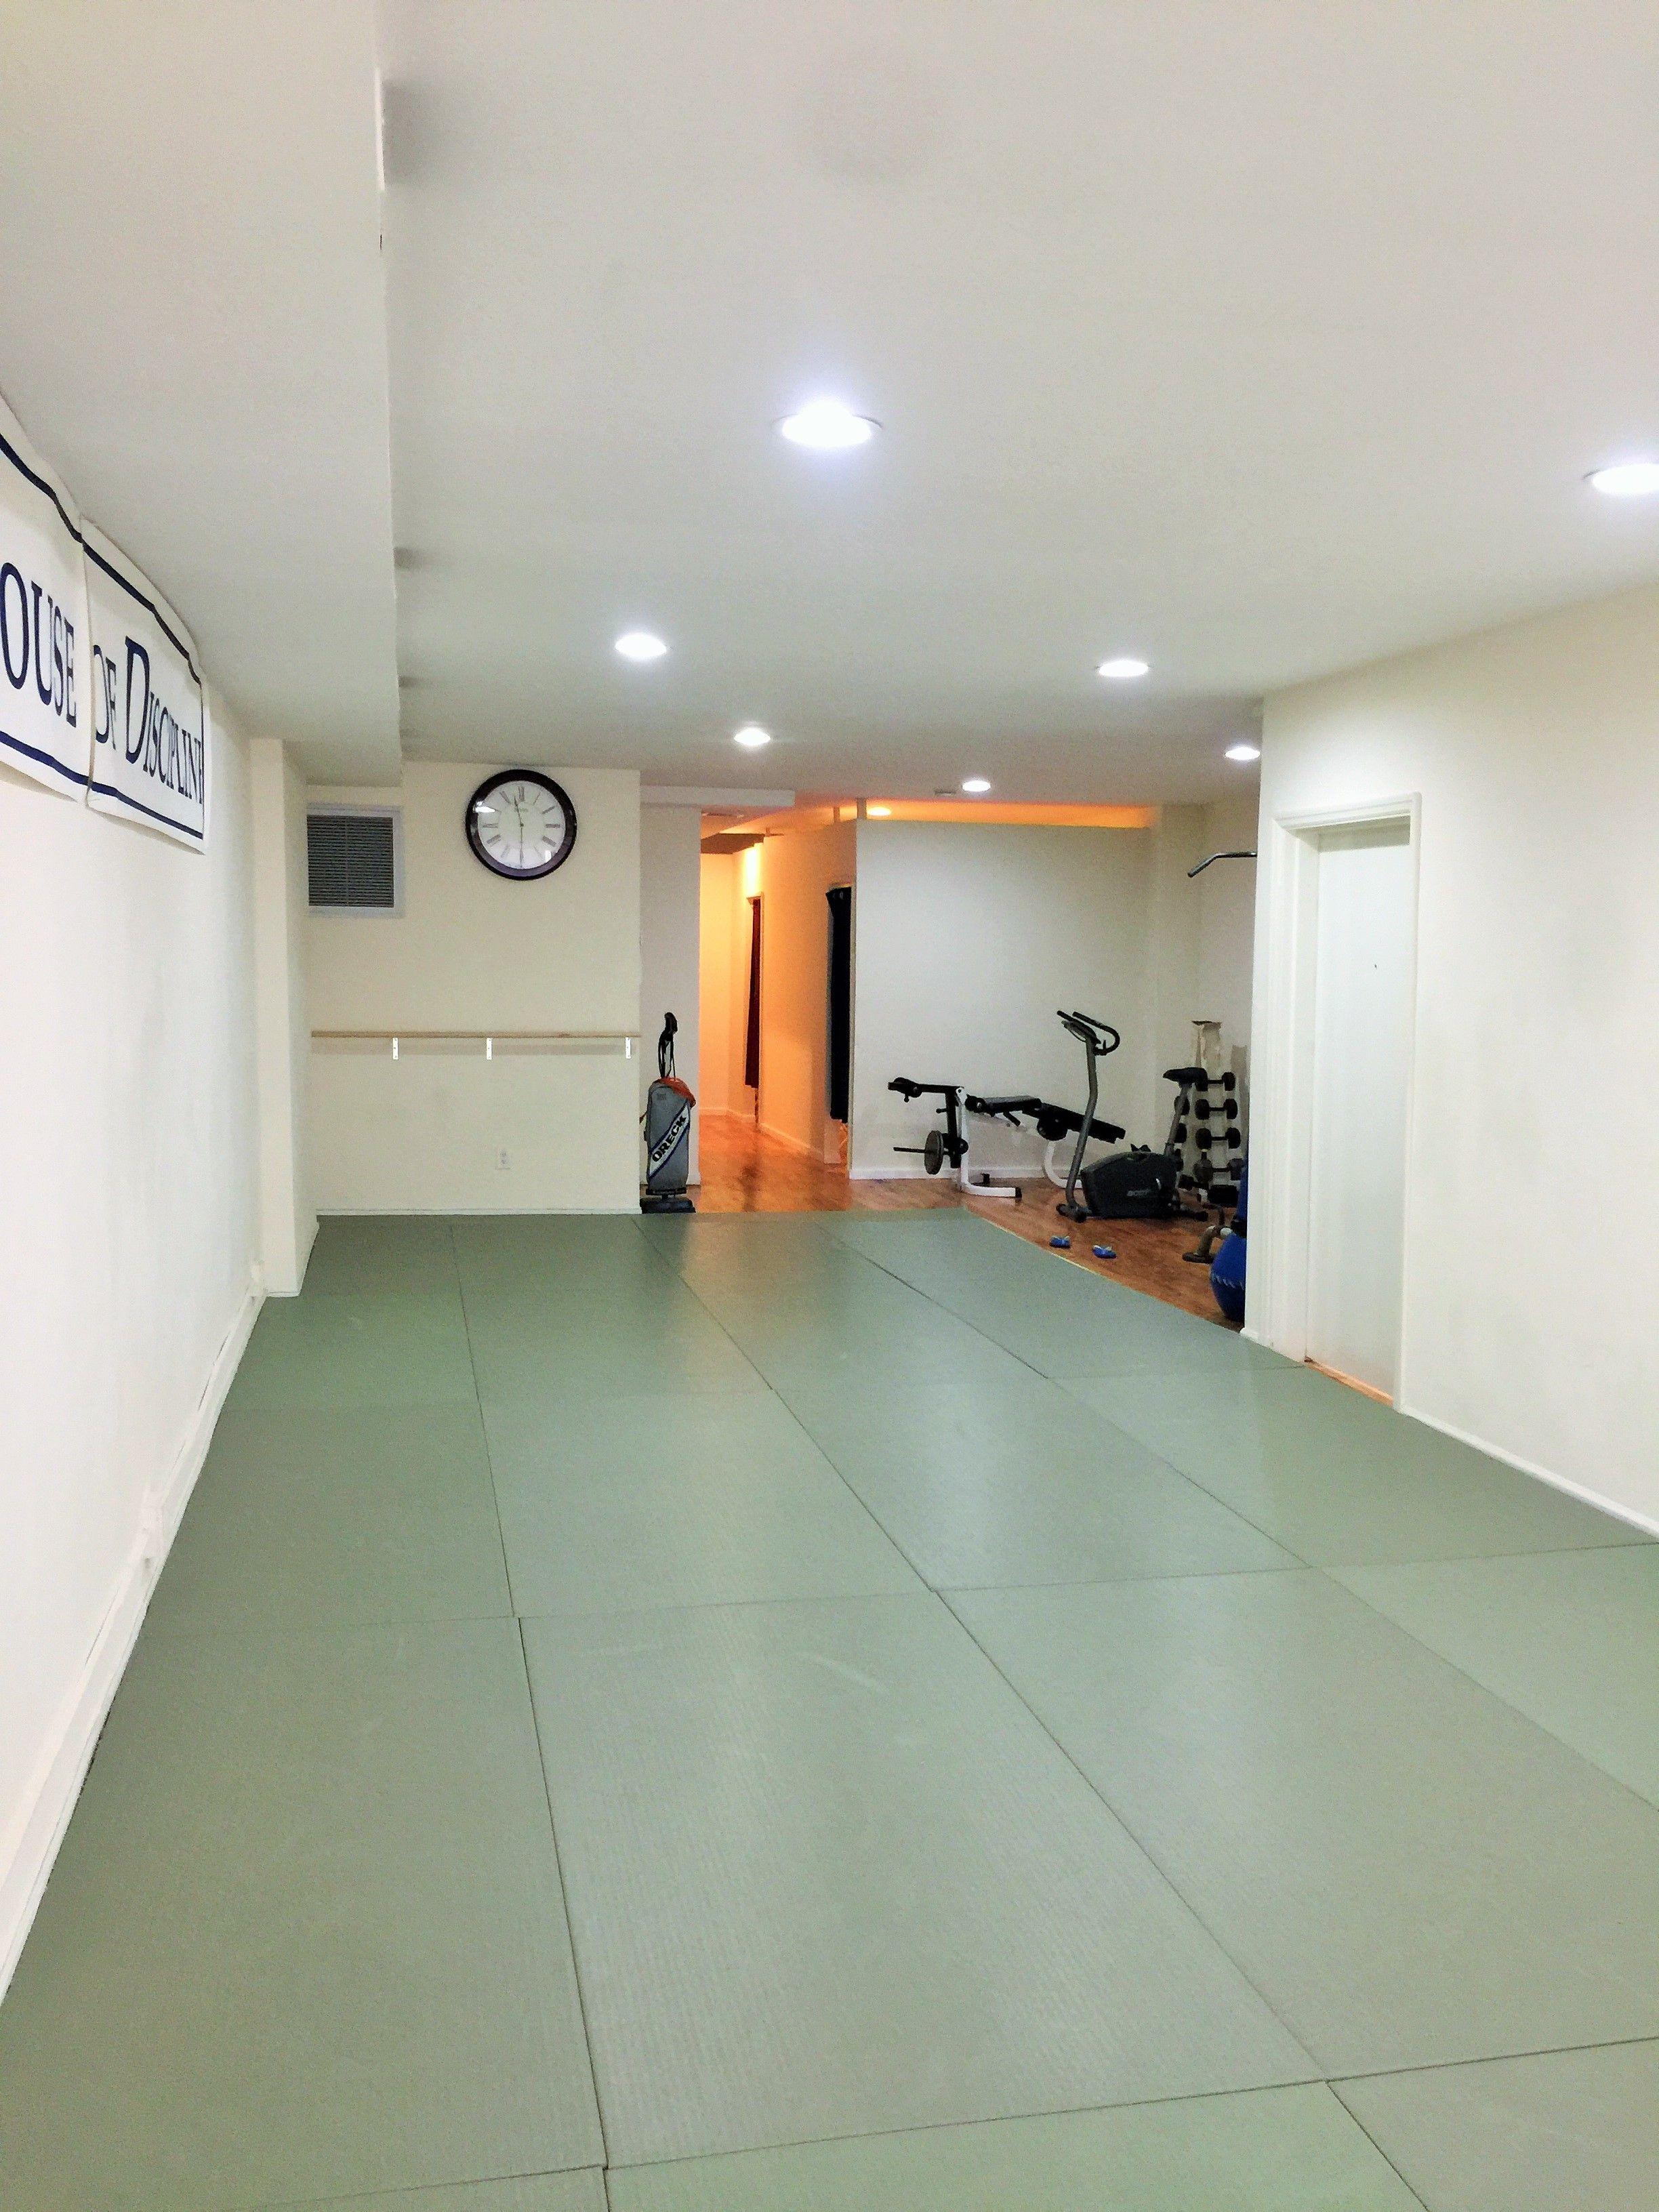 Sj kim s taekwondo martial arts school fitness gym studio